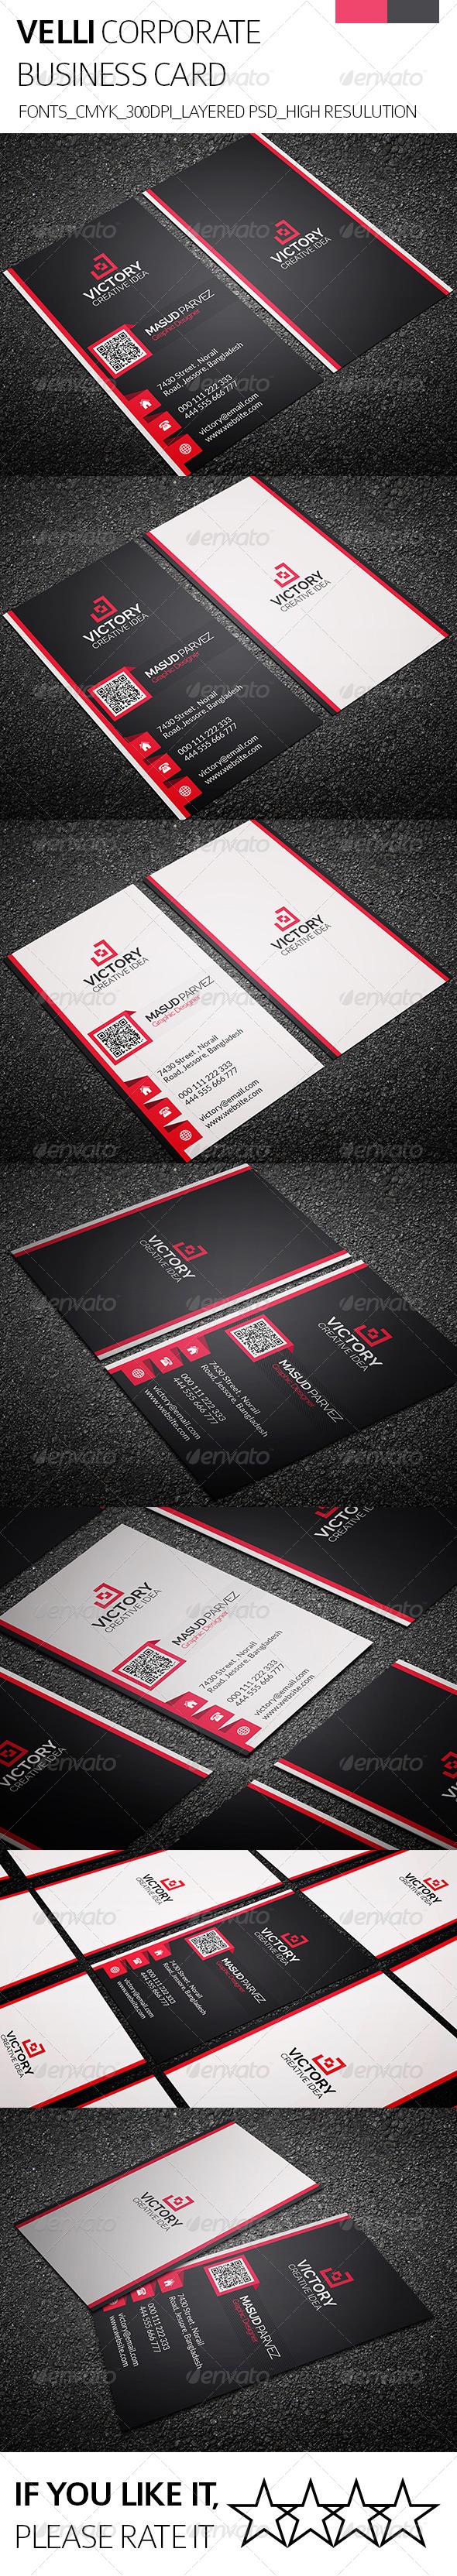 Velli & Corporate Business Card - Corporate Business Cards